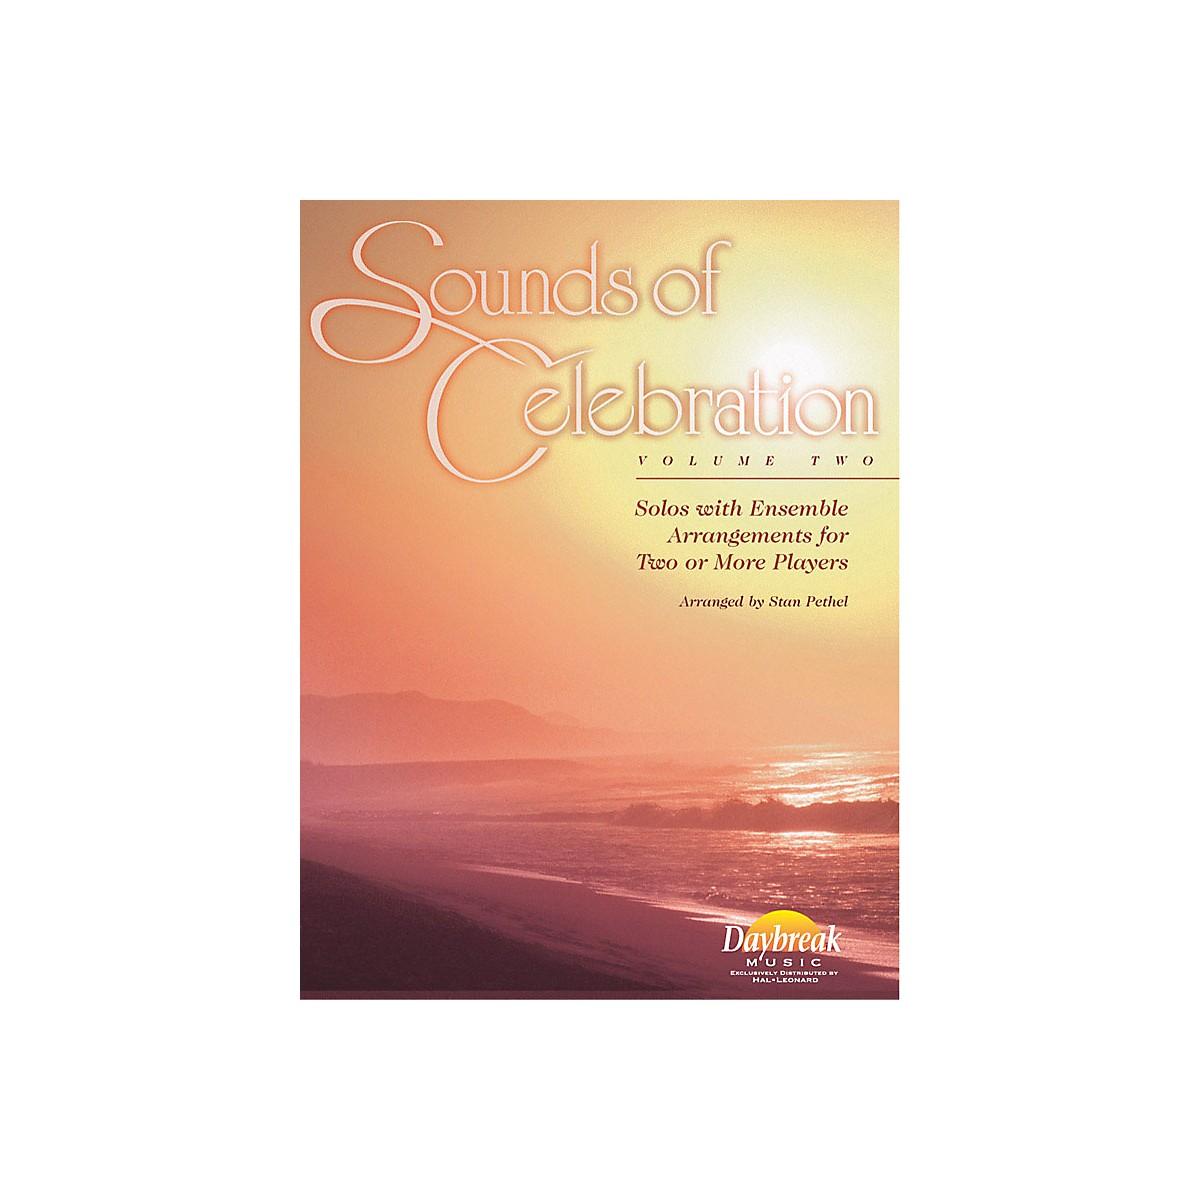 Daybreak Music Sounds of Celebration - Volume 2 (Clarinet) Clarinet Arranged by Stan Pethel